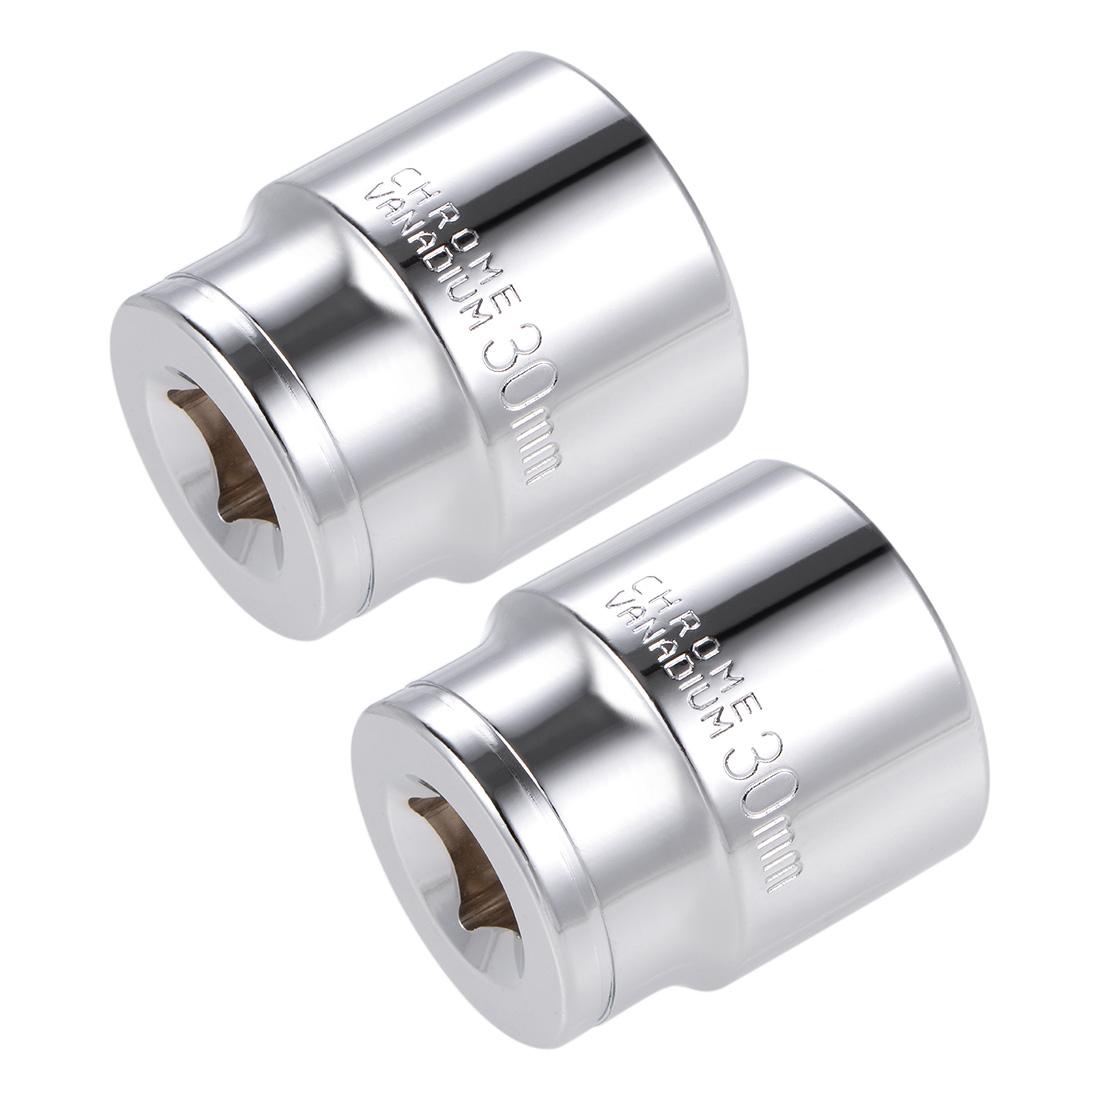 1/2-inch Drive E30 Universal Spline Socket Shallow 12 Point Cr-V Steel 2 pcs